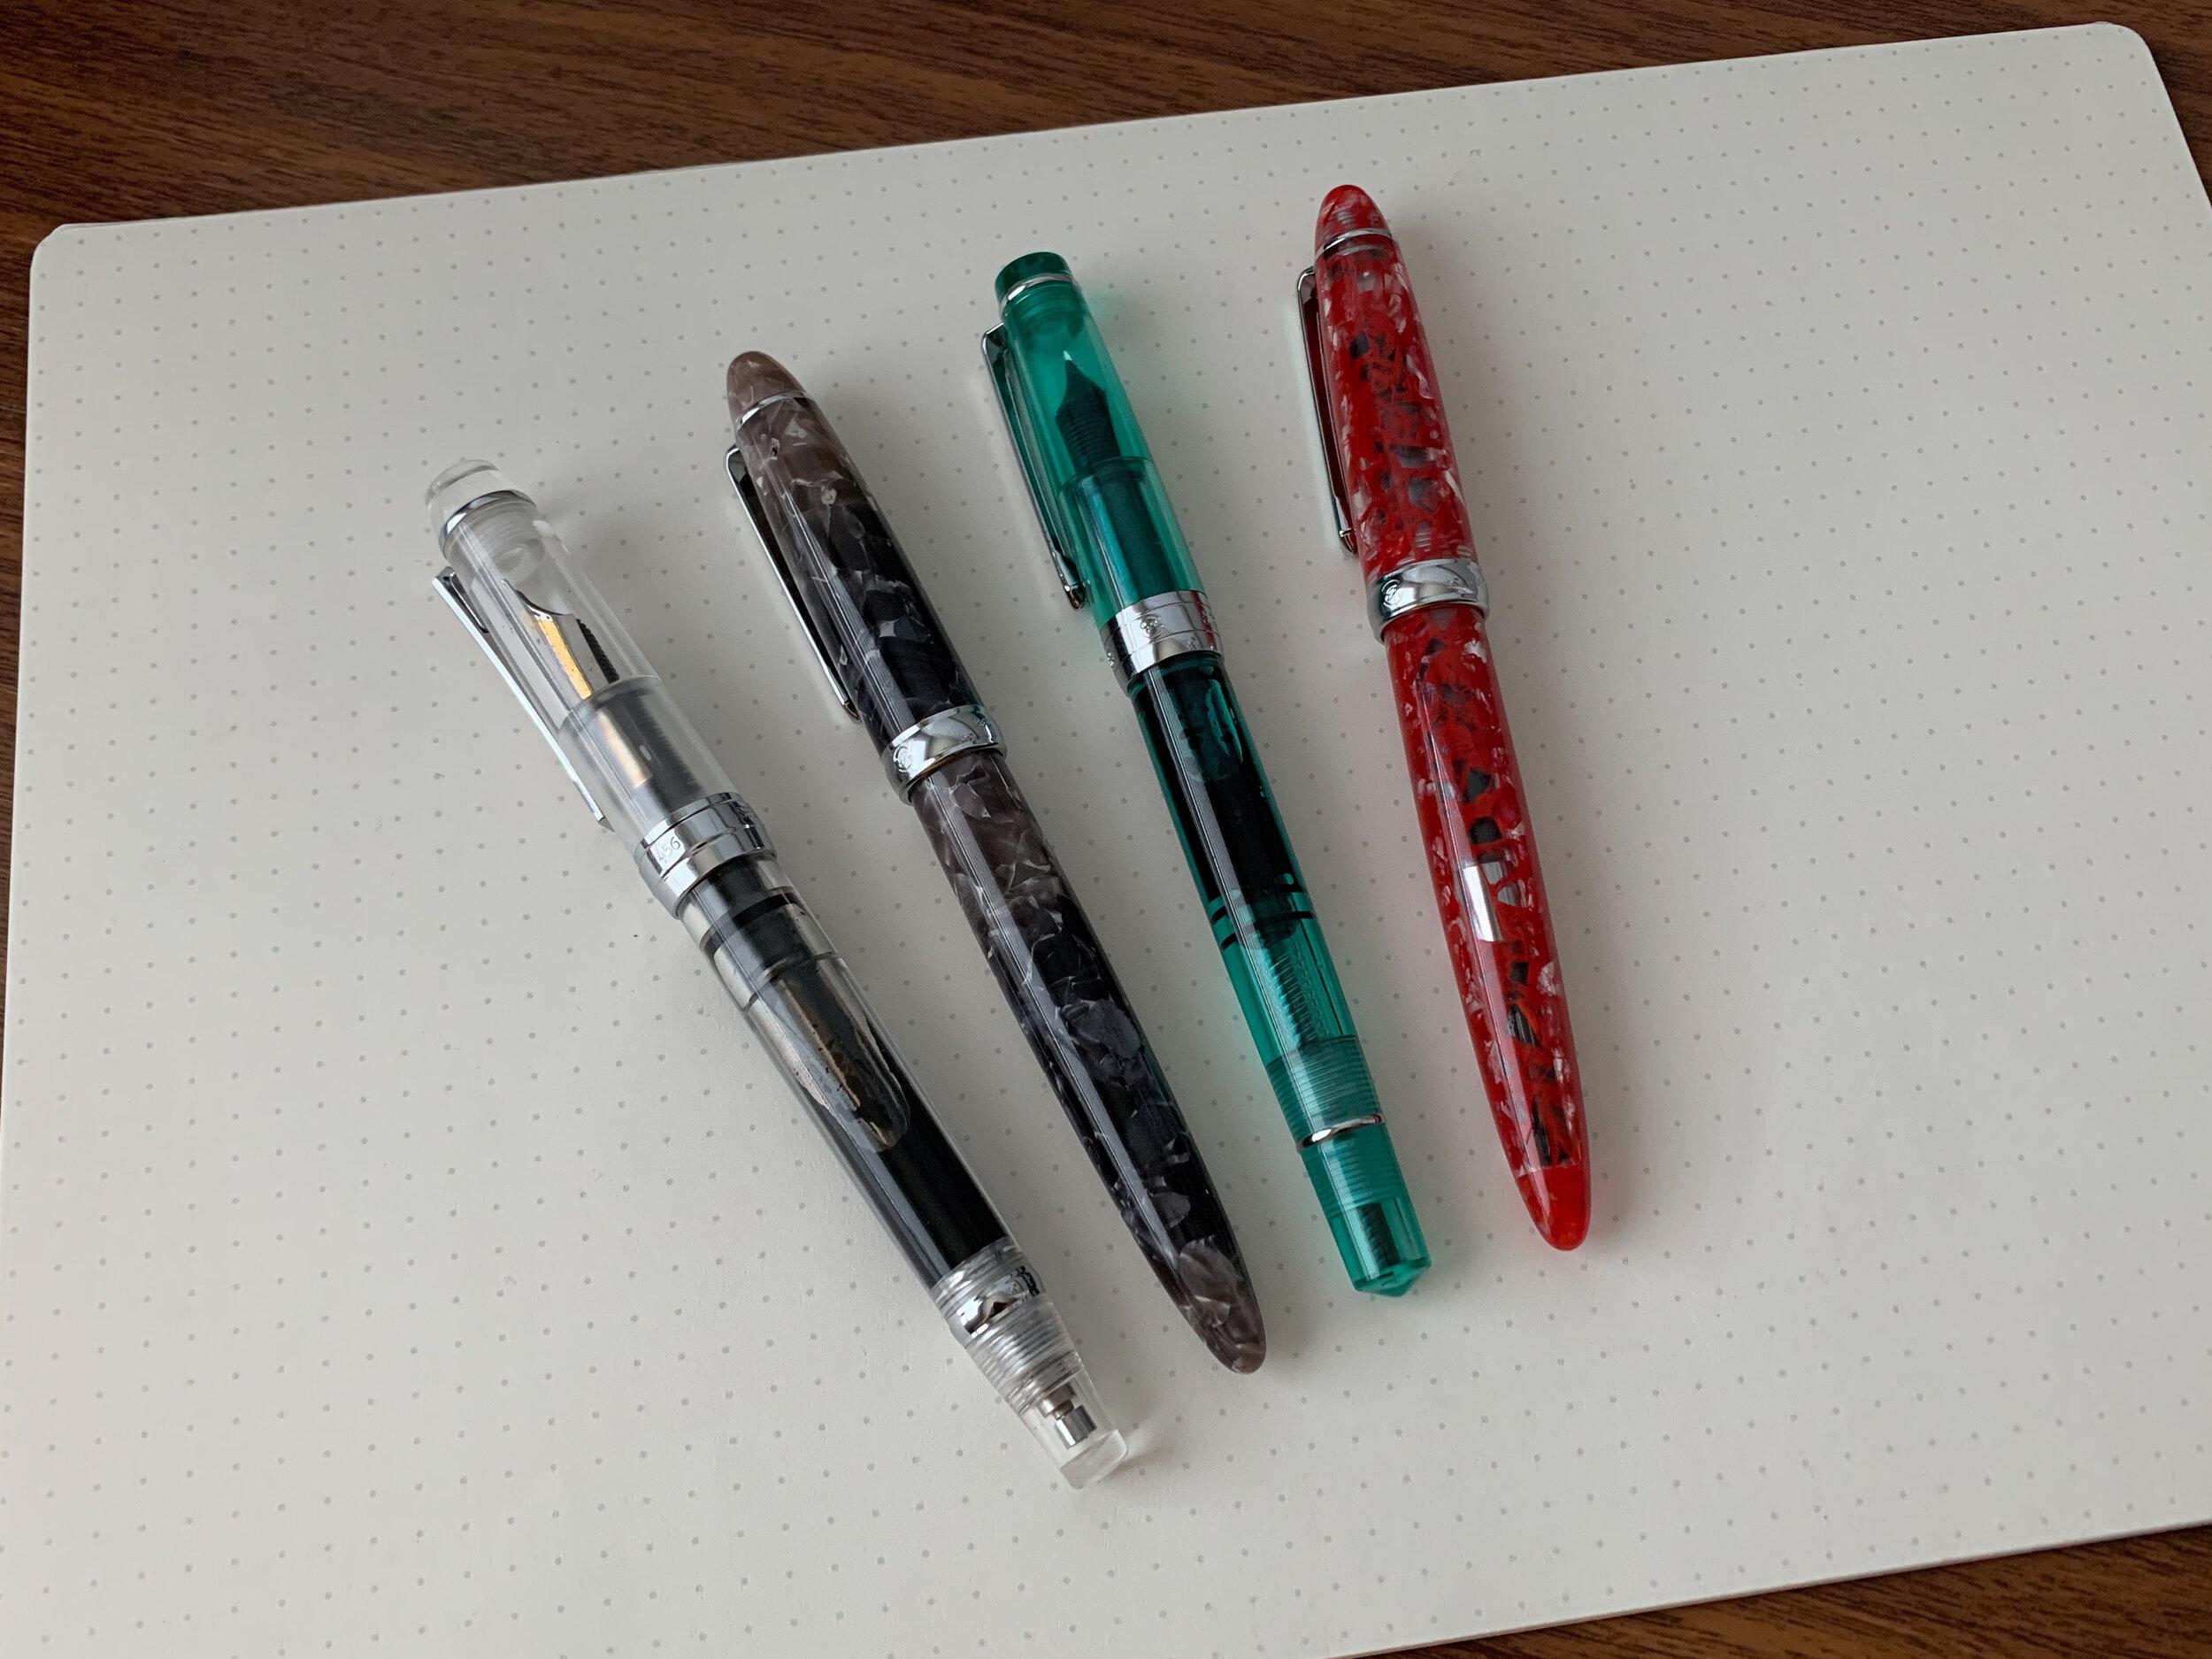 PenBBS-Fountain-Pen-Comparison